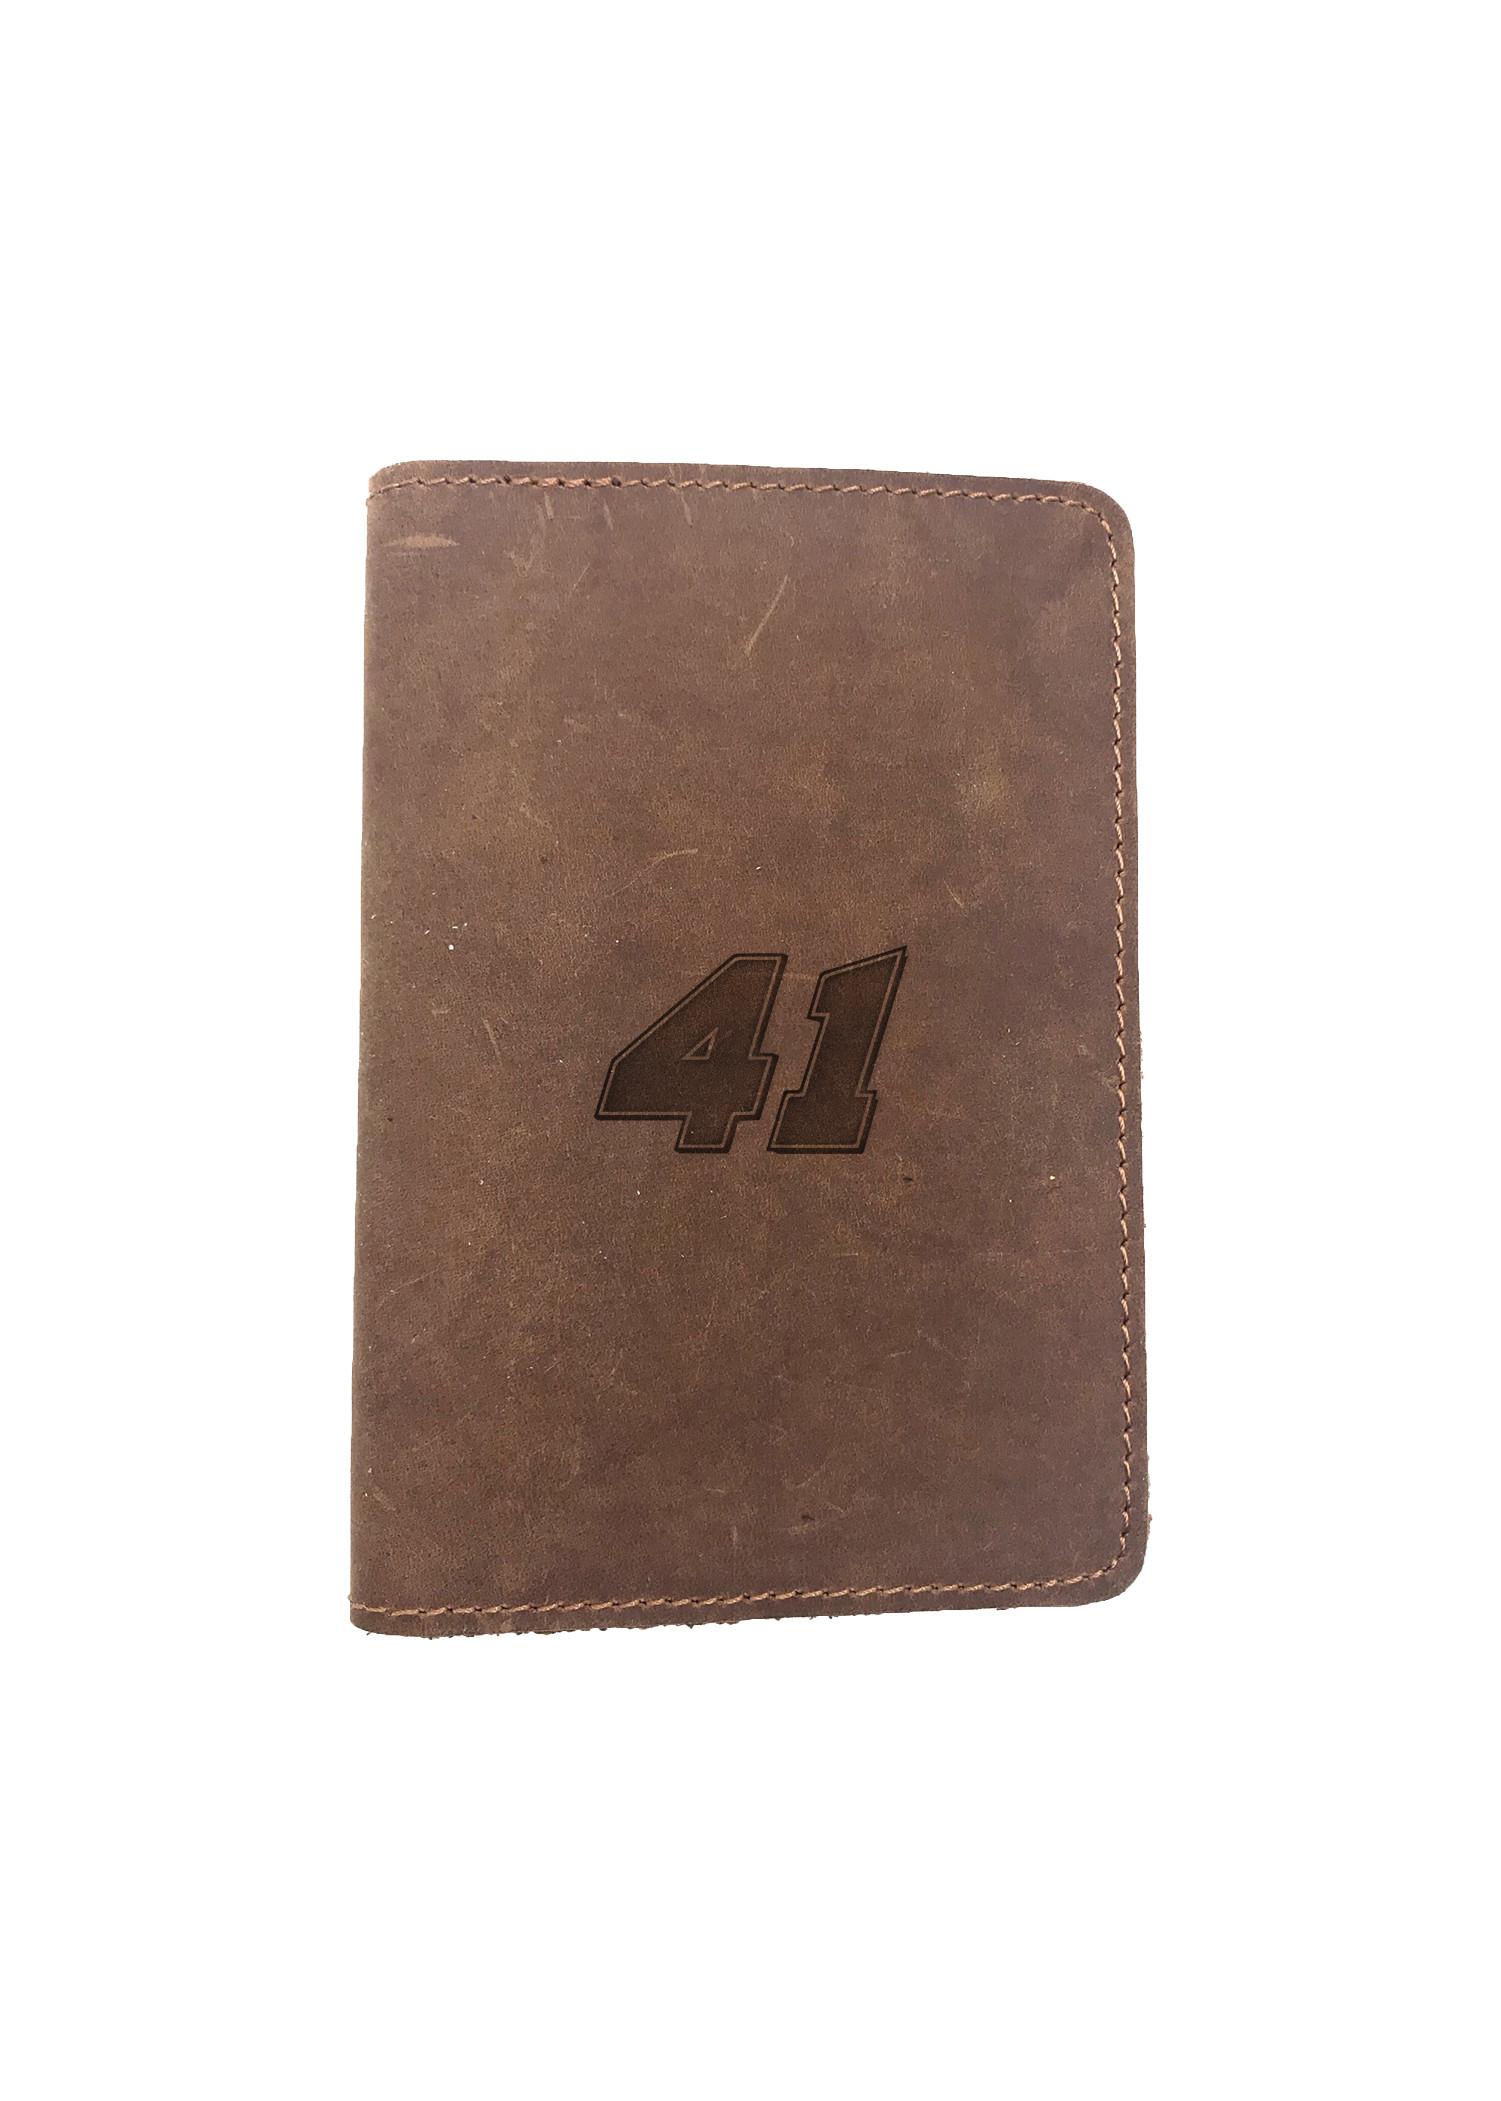 Passport Cover Bao Da Hộ Chiếu Da Sáp Khắc Hình Số NA 41 NASCAR 41 (BROWN)